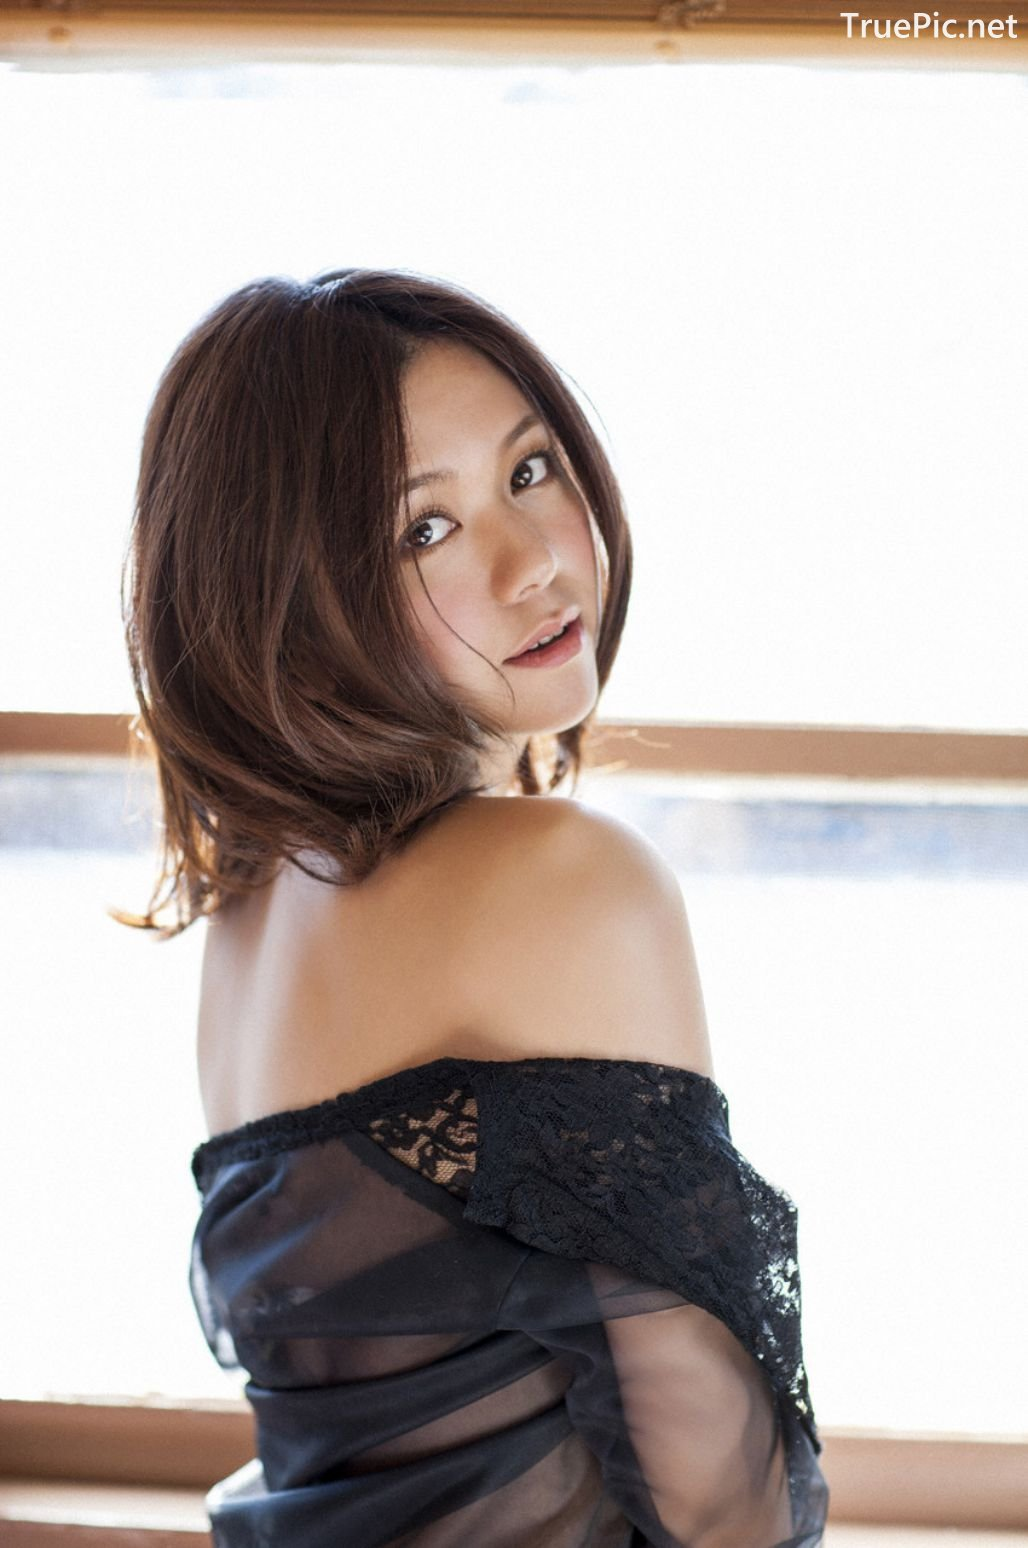 Image-Japanese-Actress-And-Model-Yuka-Konan-Hot-Beauty-Of-Angel-TruePic.net- Picture-3